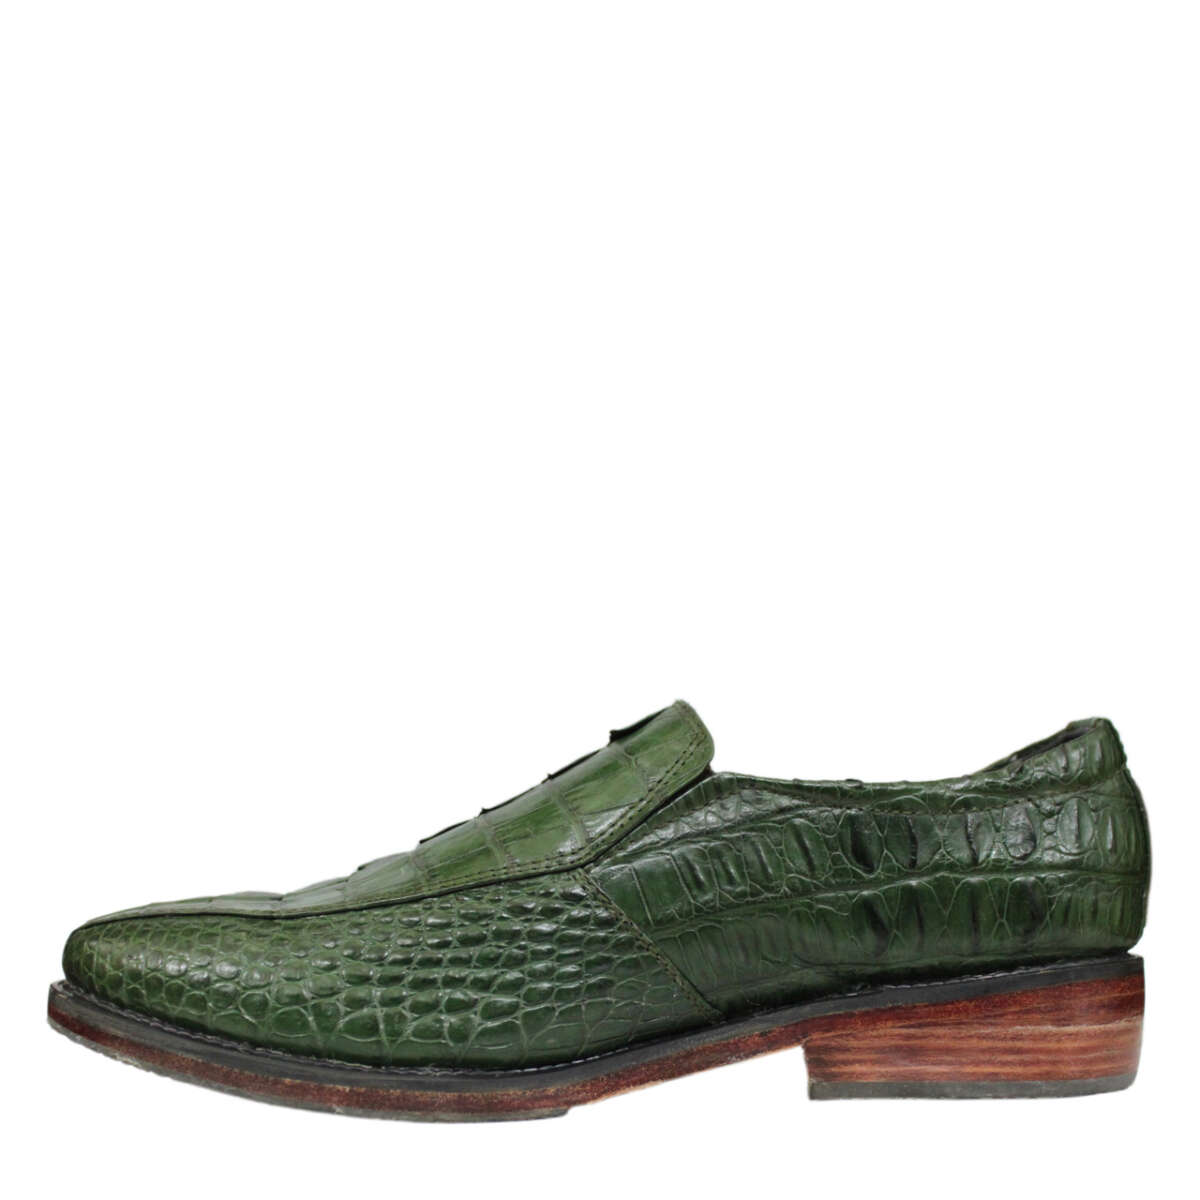 Giày nam da cá sấu S858b